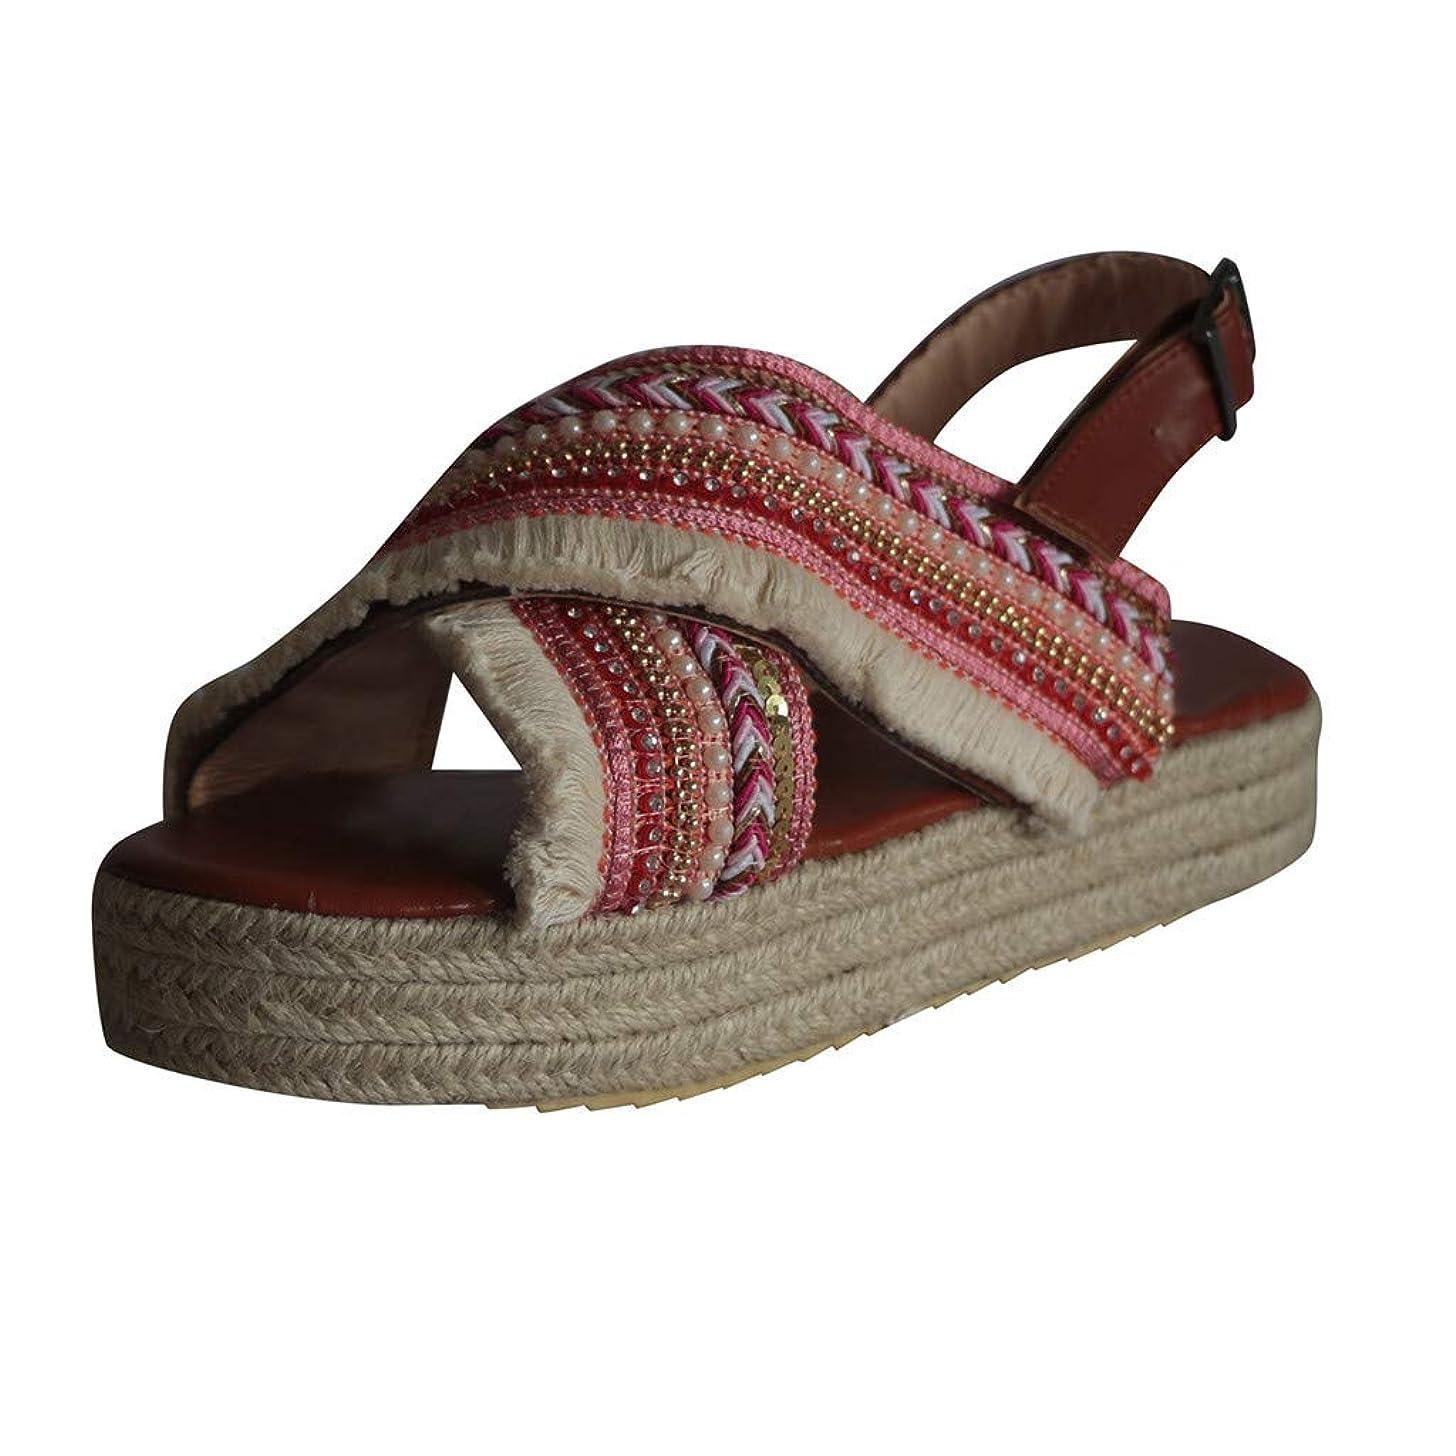 Women's Casual Espadrilles Cross Strap Beach Multi Color Woven Beach Walk Shoes Peep Toe Flat Sandals JHKUNO